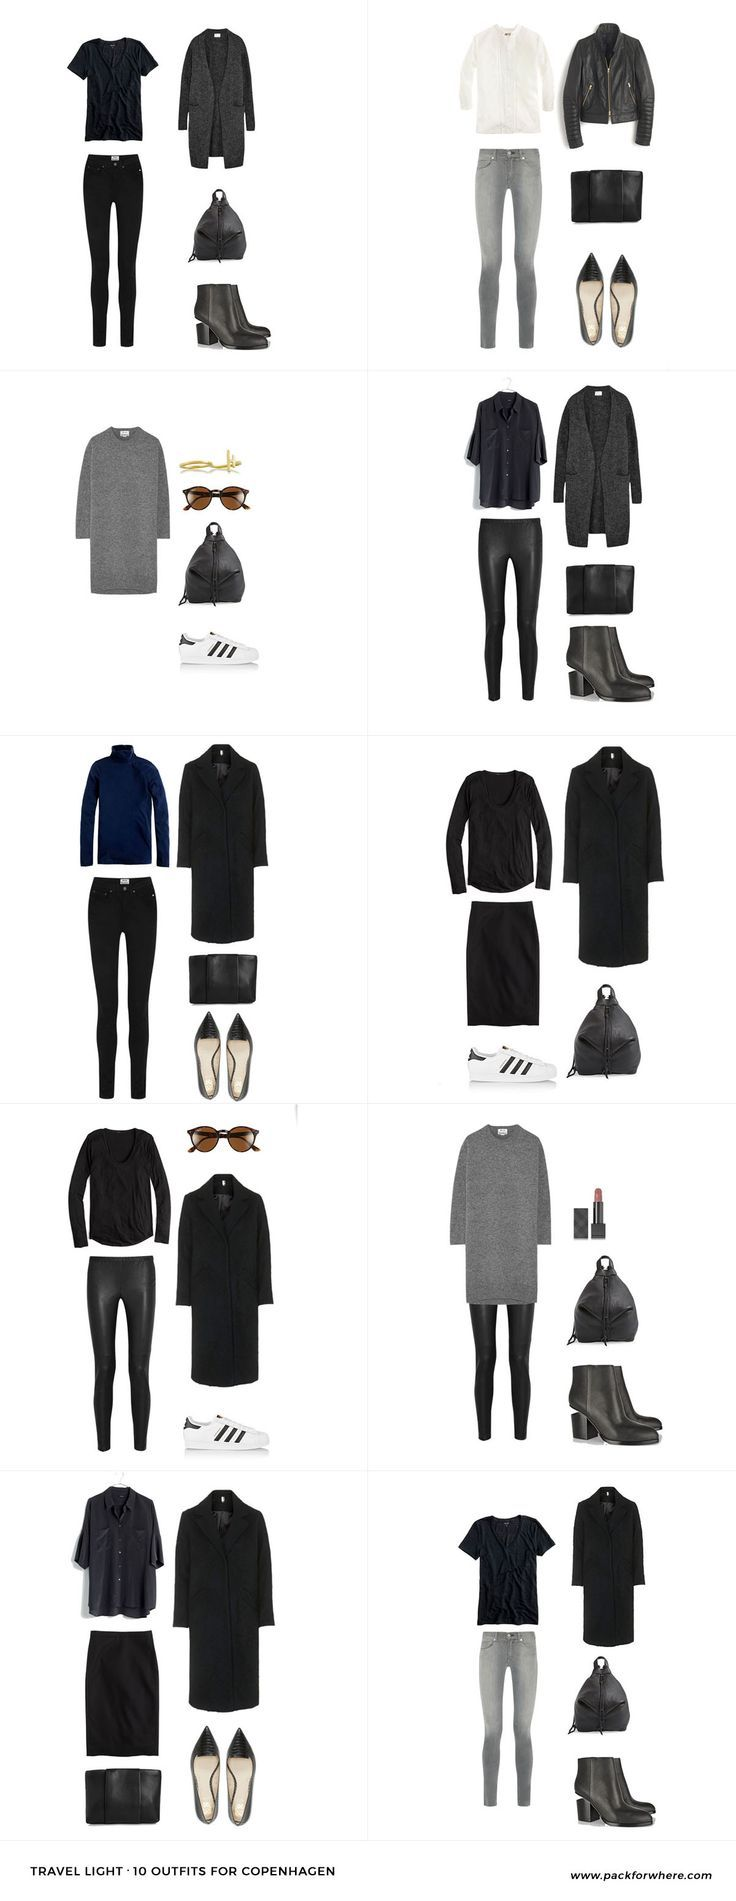 List of fashion items 71